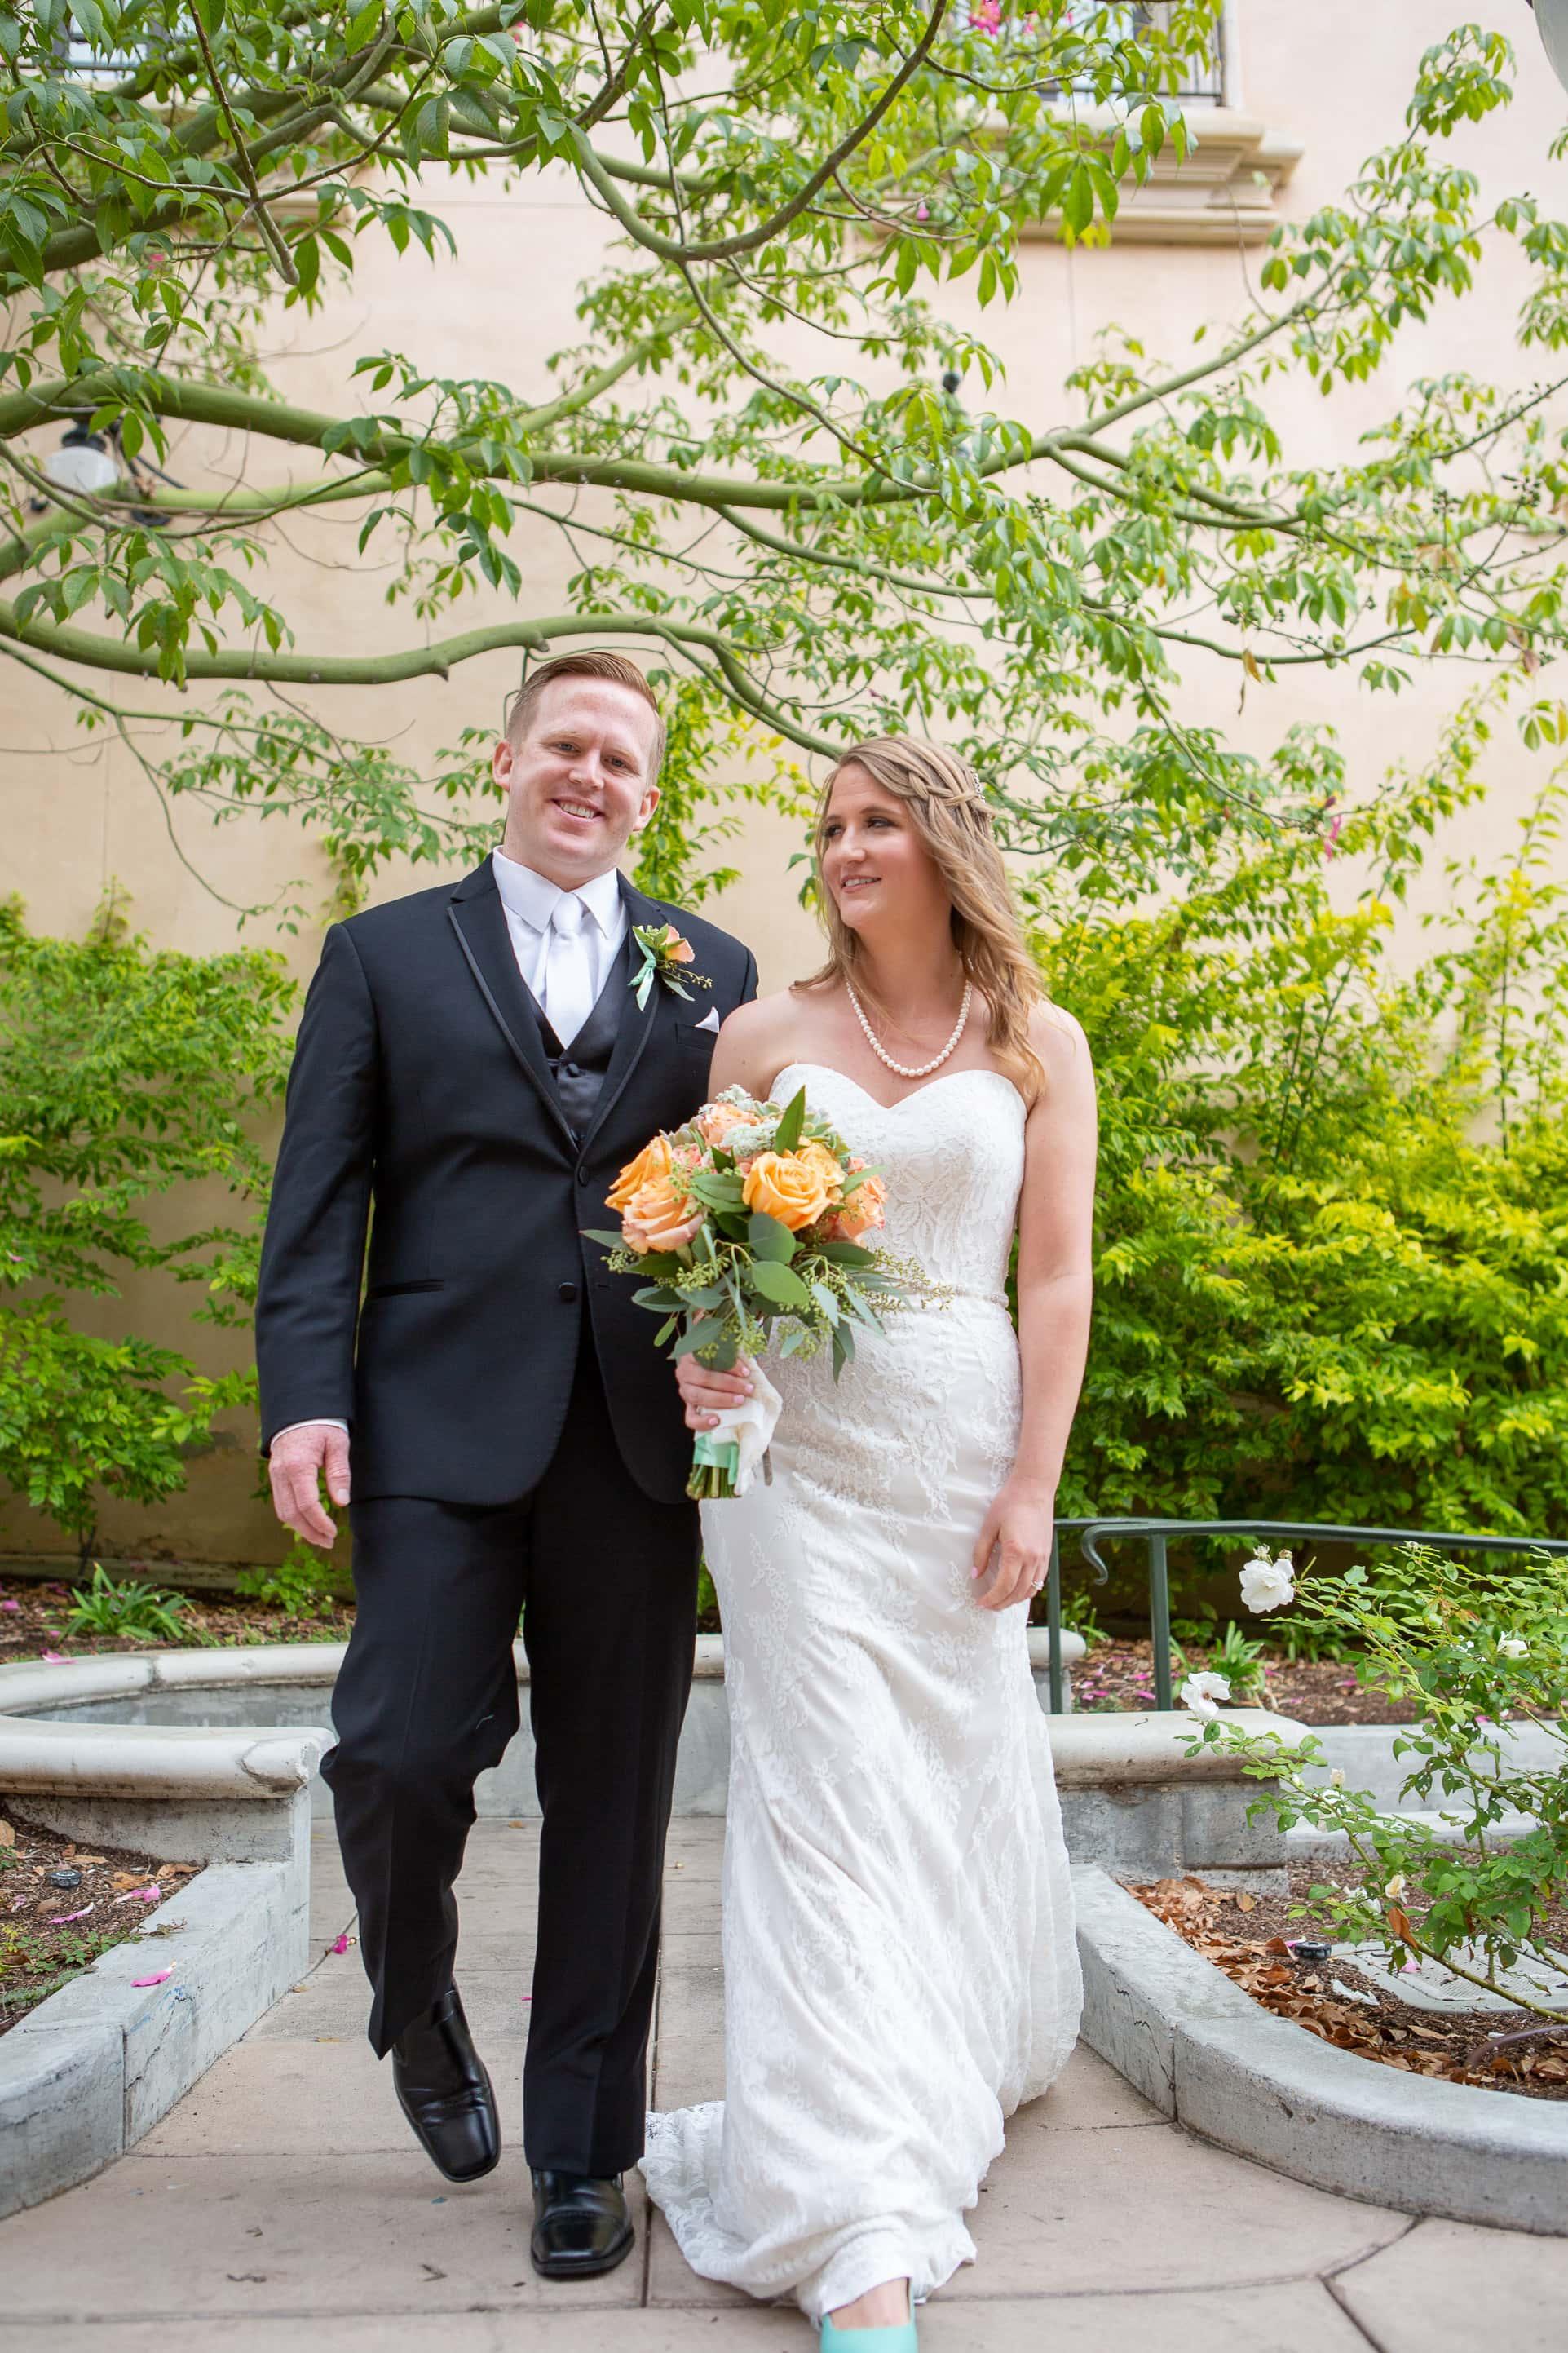 Kris & Matt's Wedding:  Prado, Balboa Park, San Diego